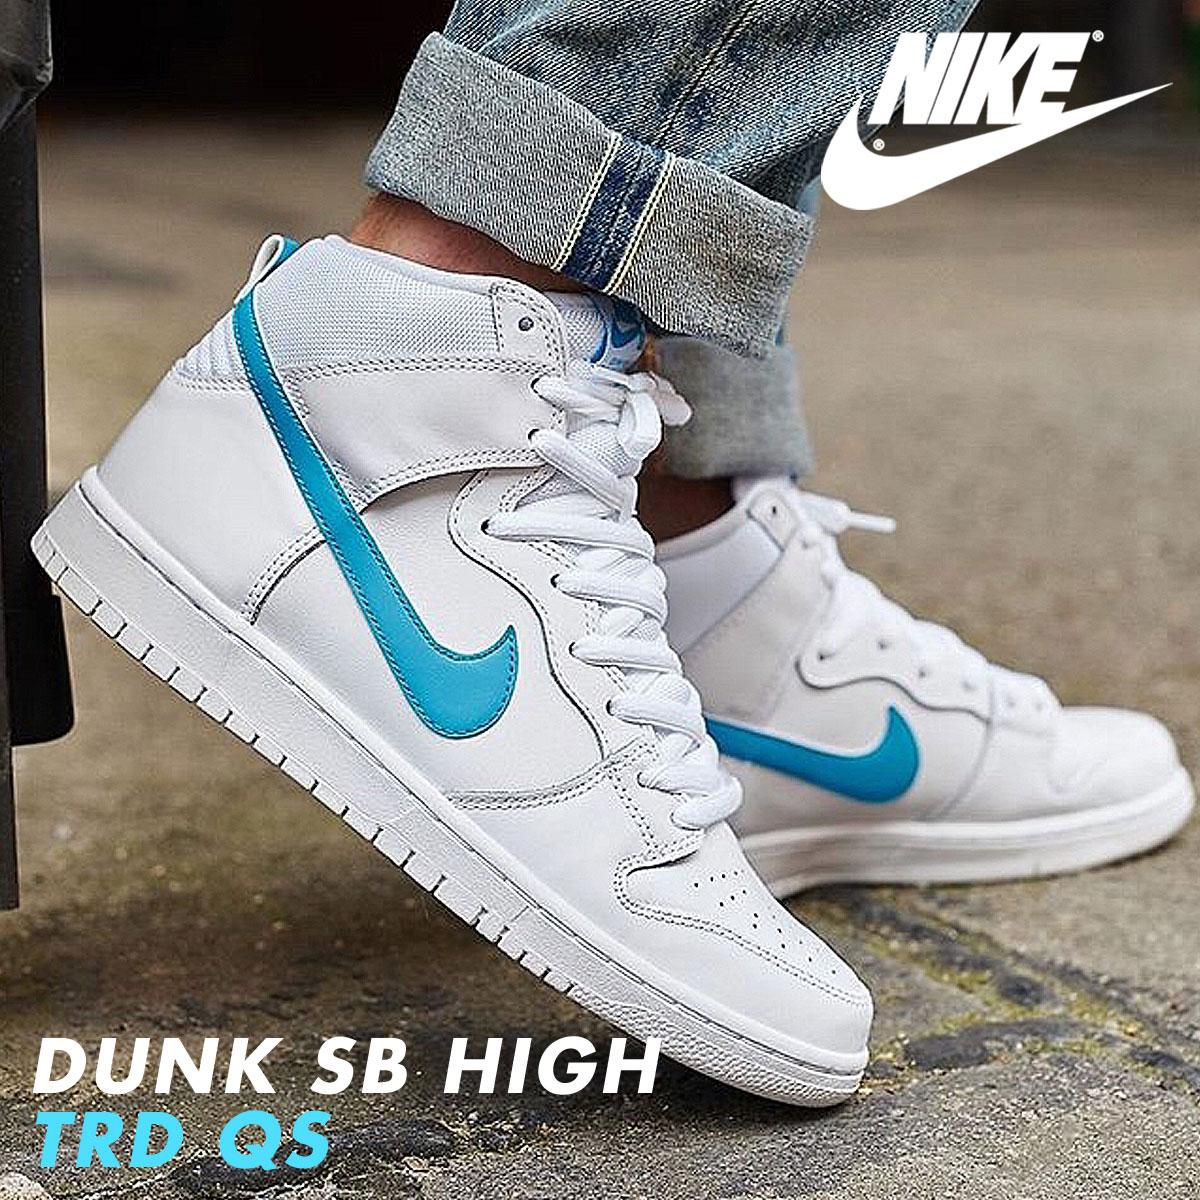 Medicina Forense Dormitorio variable  SNEAK ONLINE SHOP: NIKE SB DUNK HIGH TRD QS MULDER Nike dunk high ...